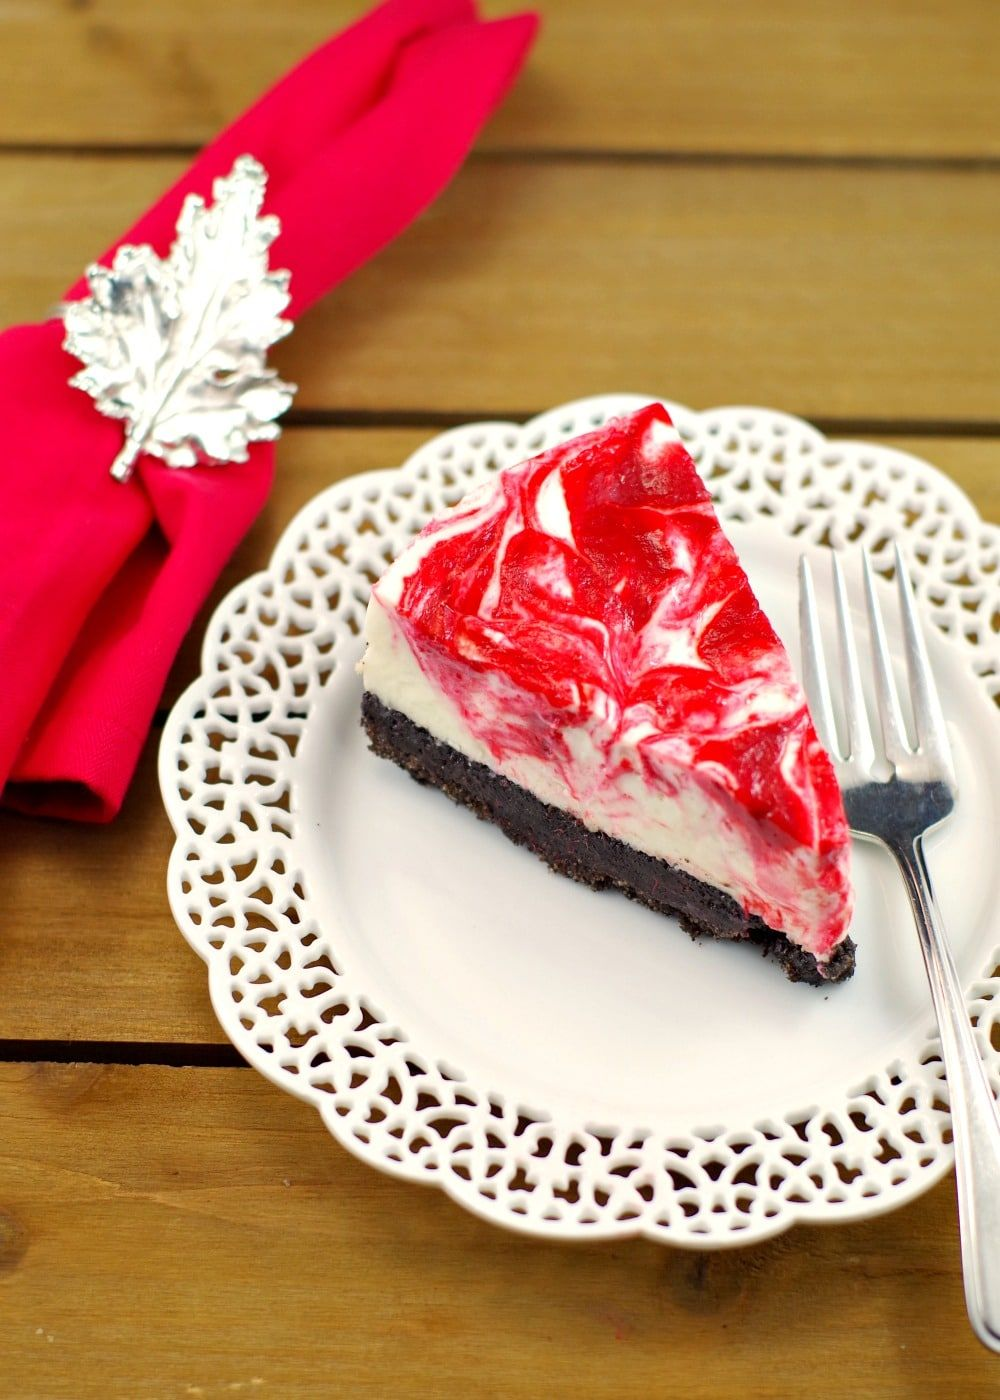 Rhubarb Red & White Chocolate Light NO BAKE Cheesecake